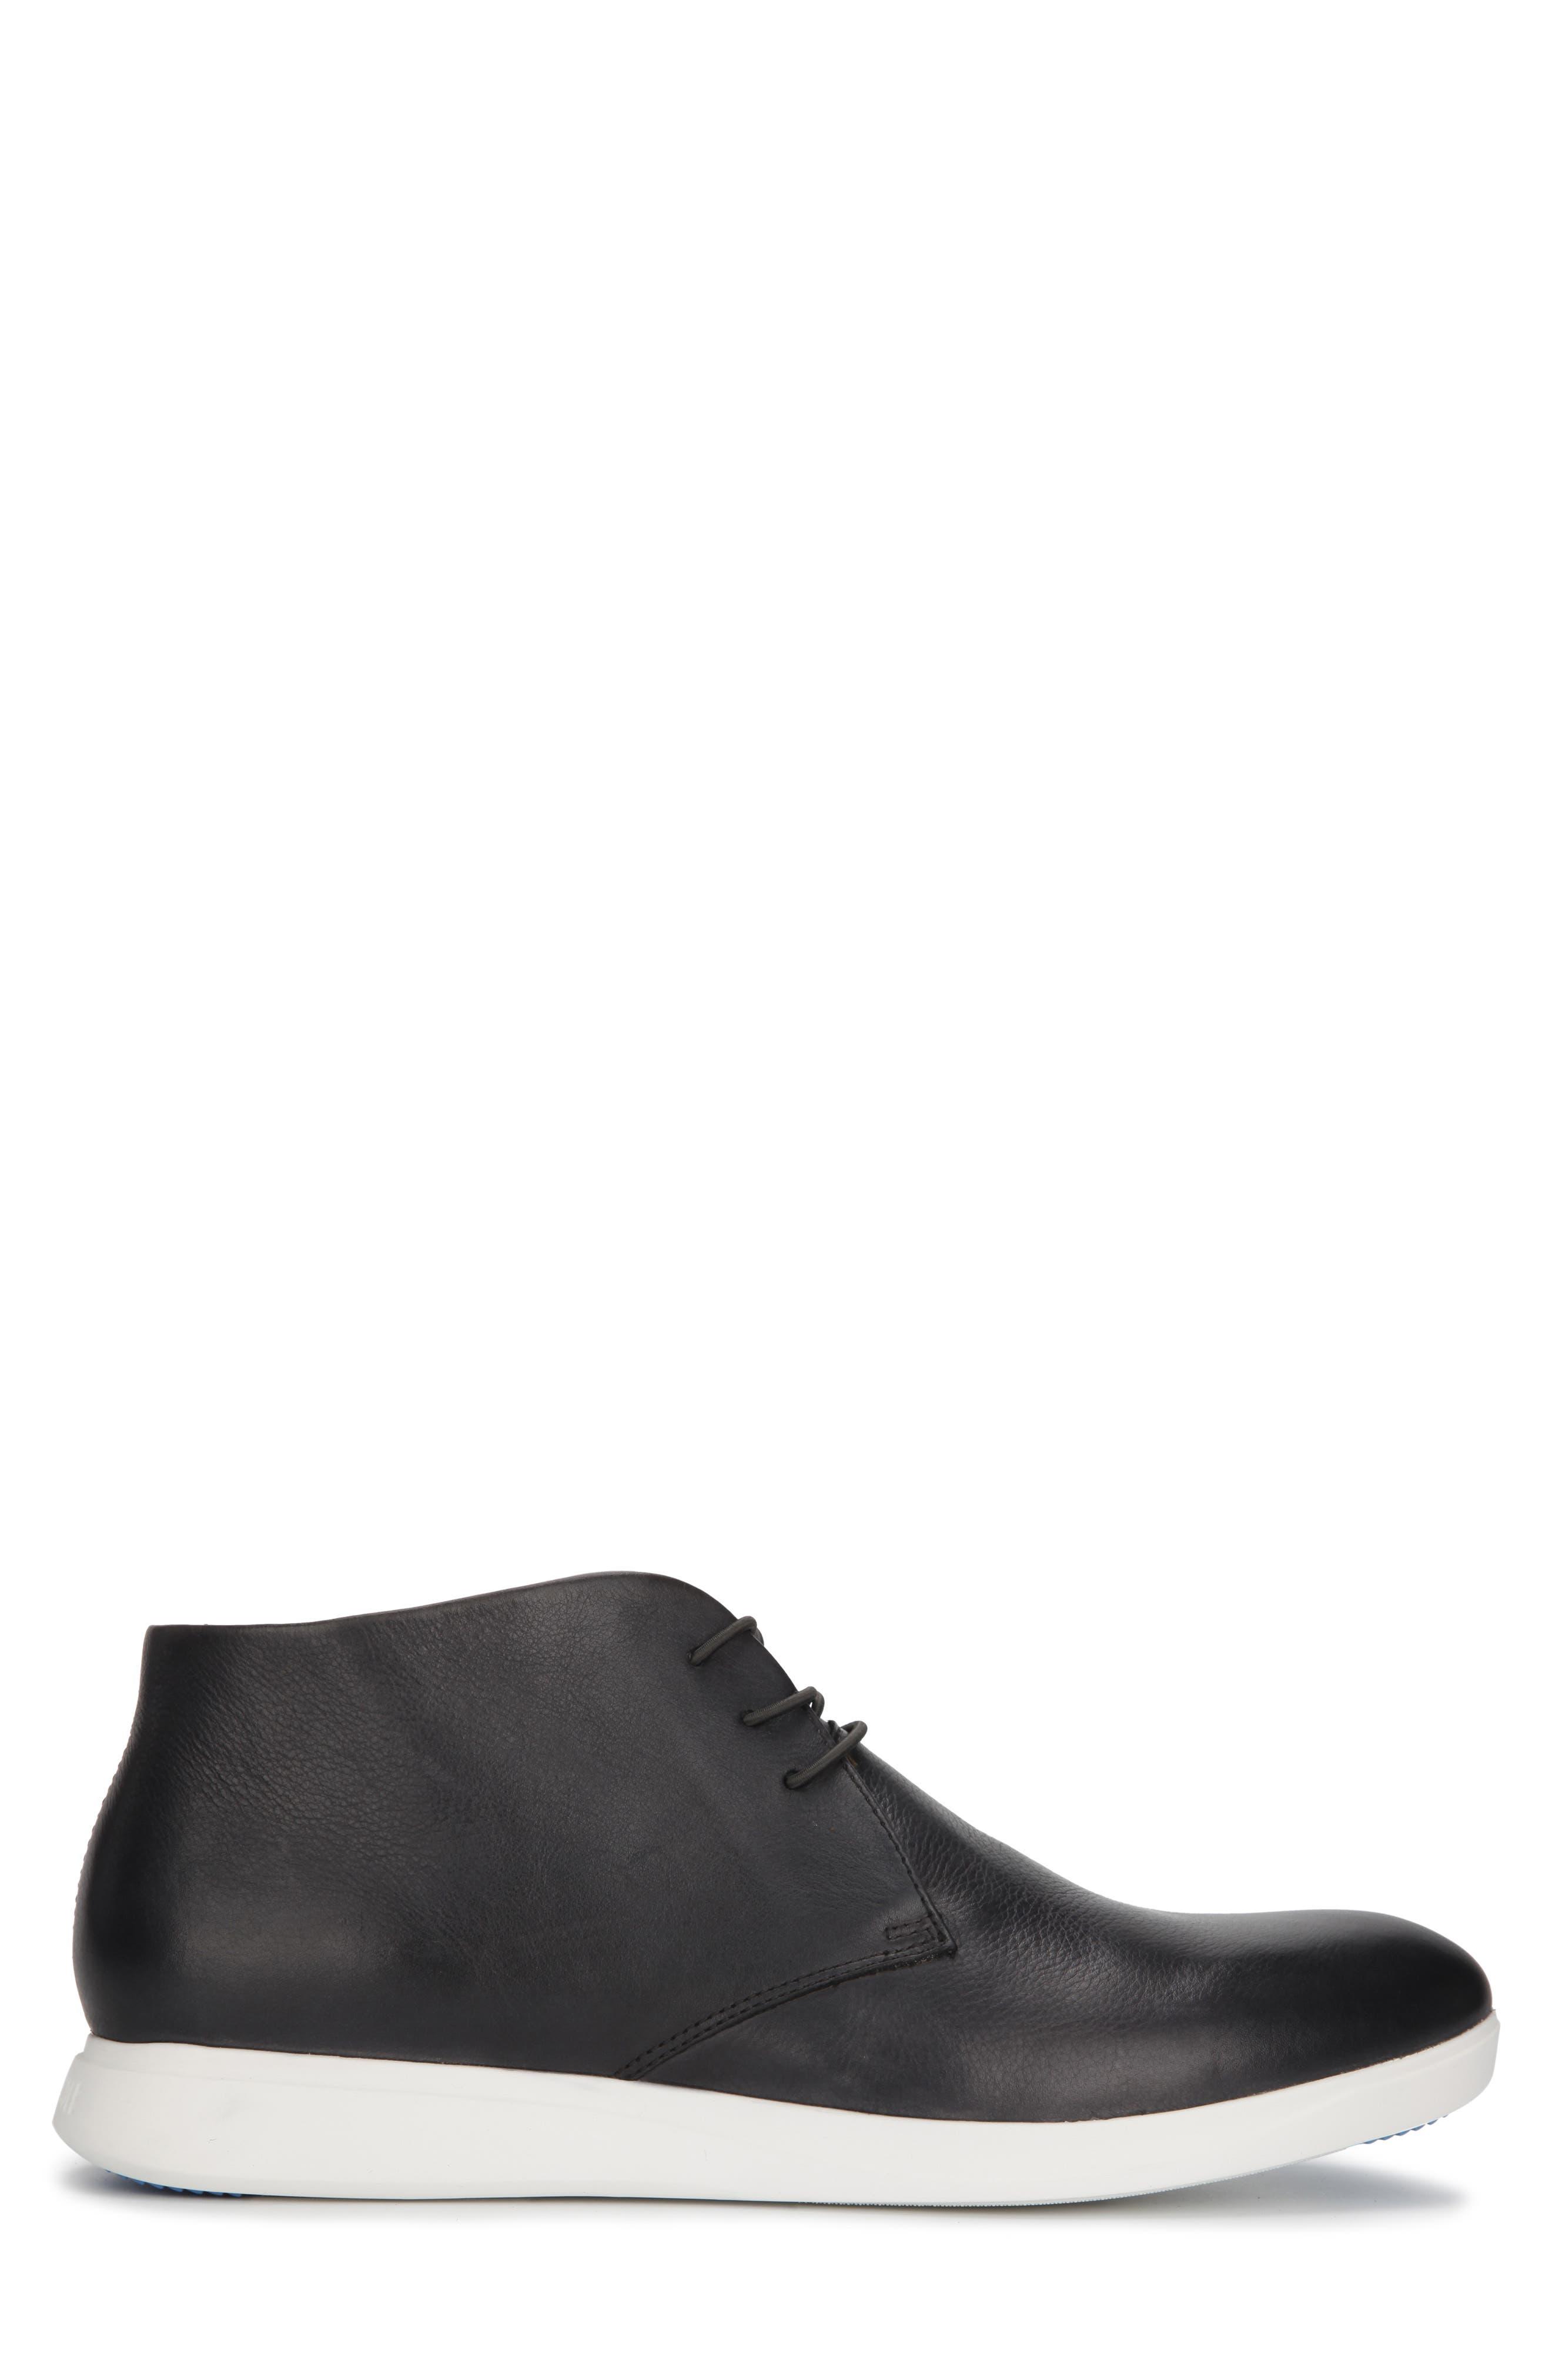 KENNETH COLE NEW YORK, Rocketpod Chukka Sneaker, Alternate thumbnail 2, color, GREY TUMBLED LEATHER